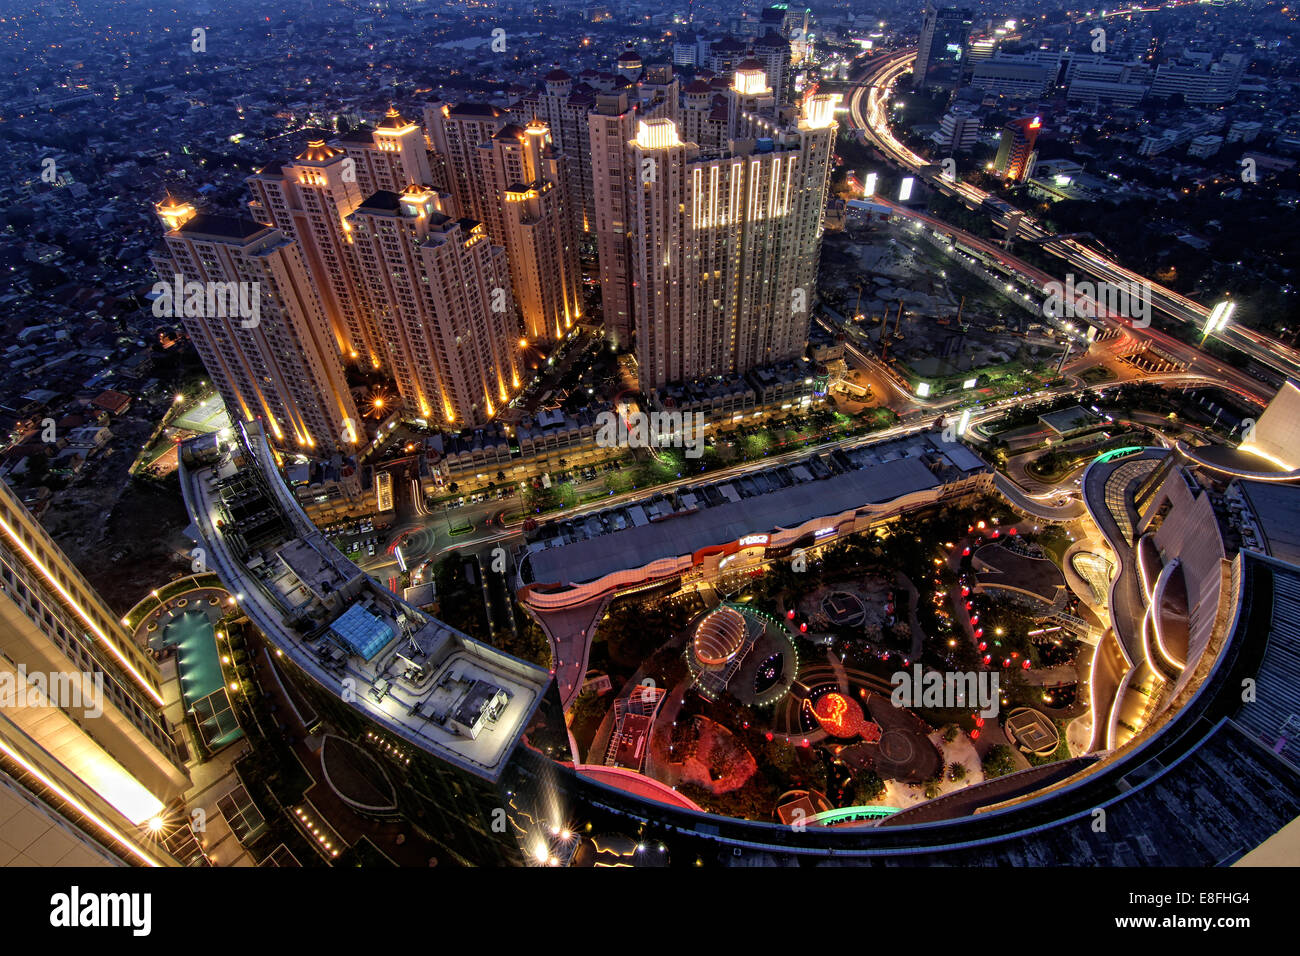 Indonesia, Yakarta, Región Capital especial Daerah Khusus Ibukota Yakarta, Letjen S Parman, noche paisaje visto Imagen De Stock